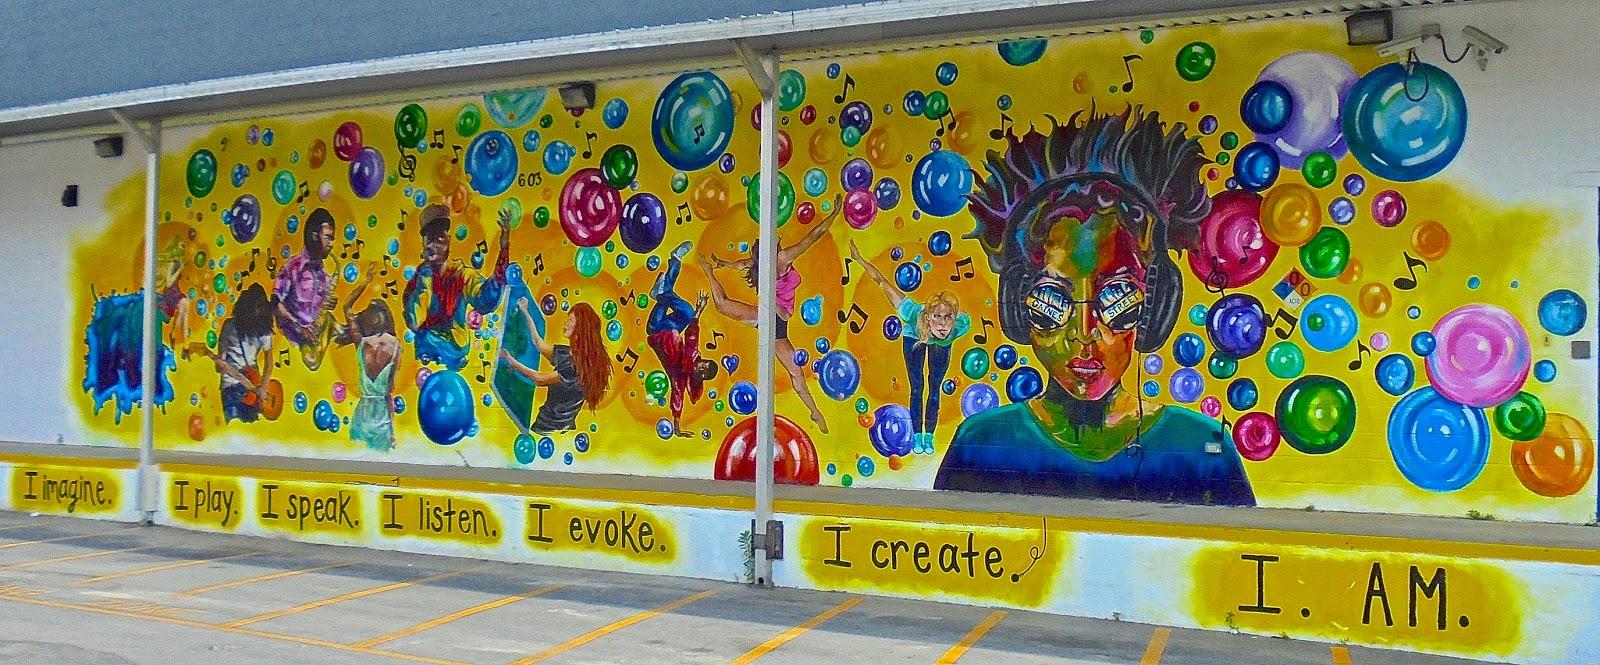 Tallahassee Daily Photo: Monday Mural